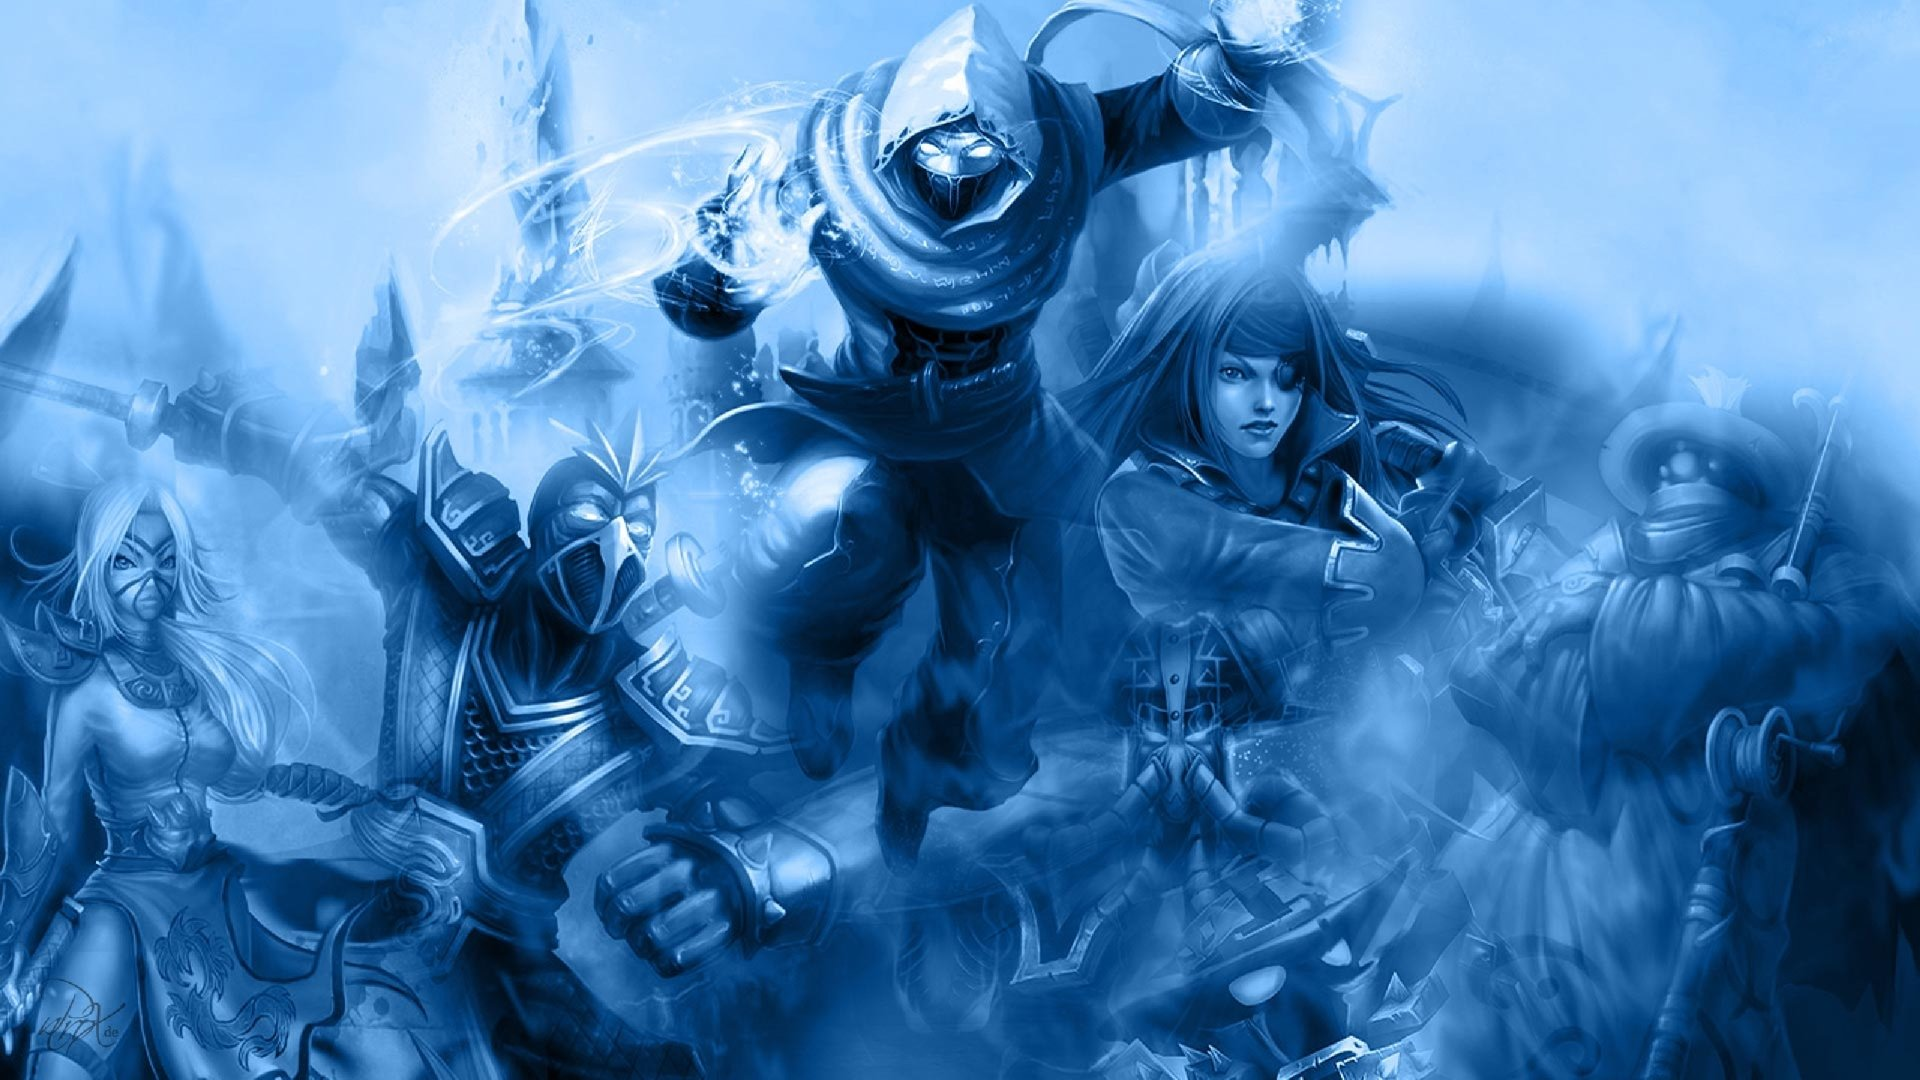 Video Game - League Of Legends  Jax (League Of Legends) Katarina (League Of Legends) Shen (League Of Legends) Akali (League Of Legends) Malzahar (League Of Legends) Wallpaper